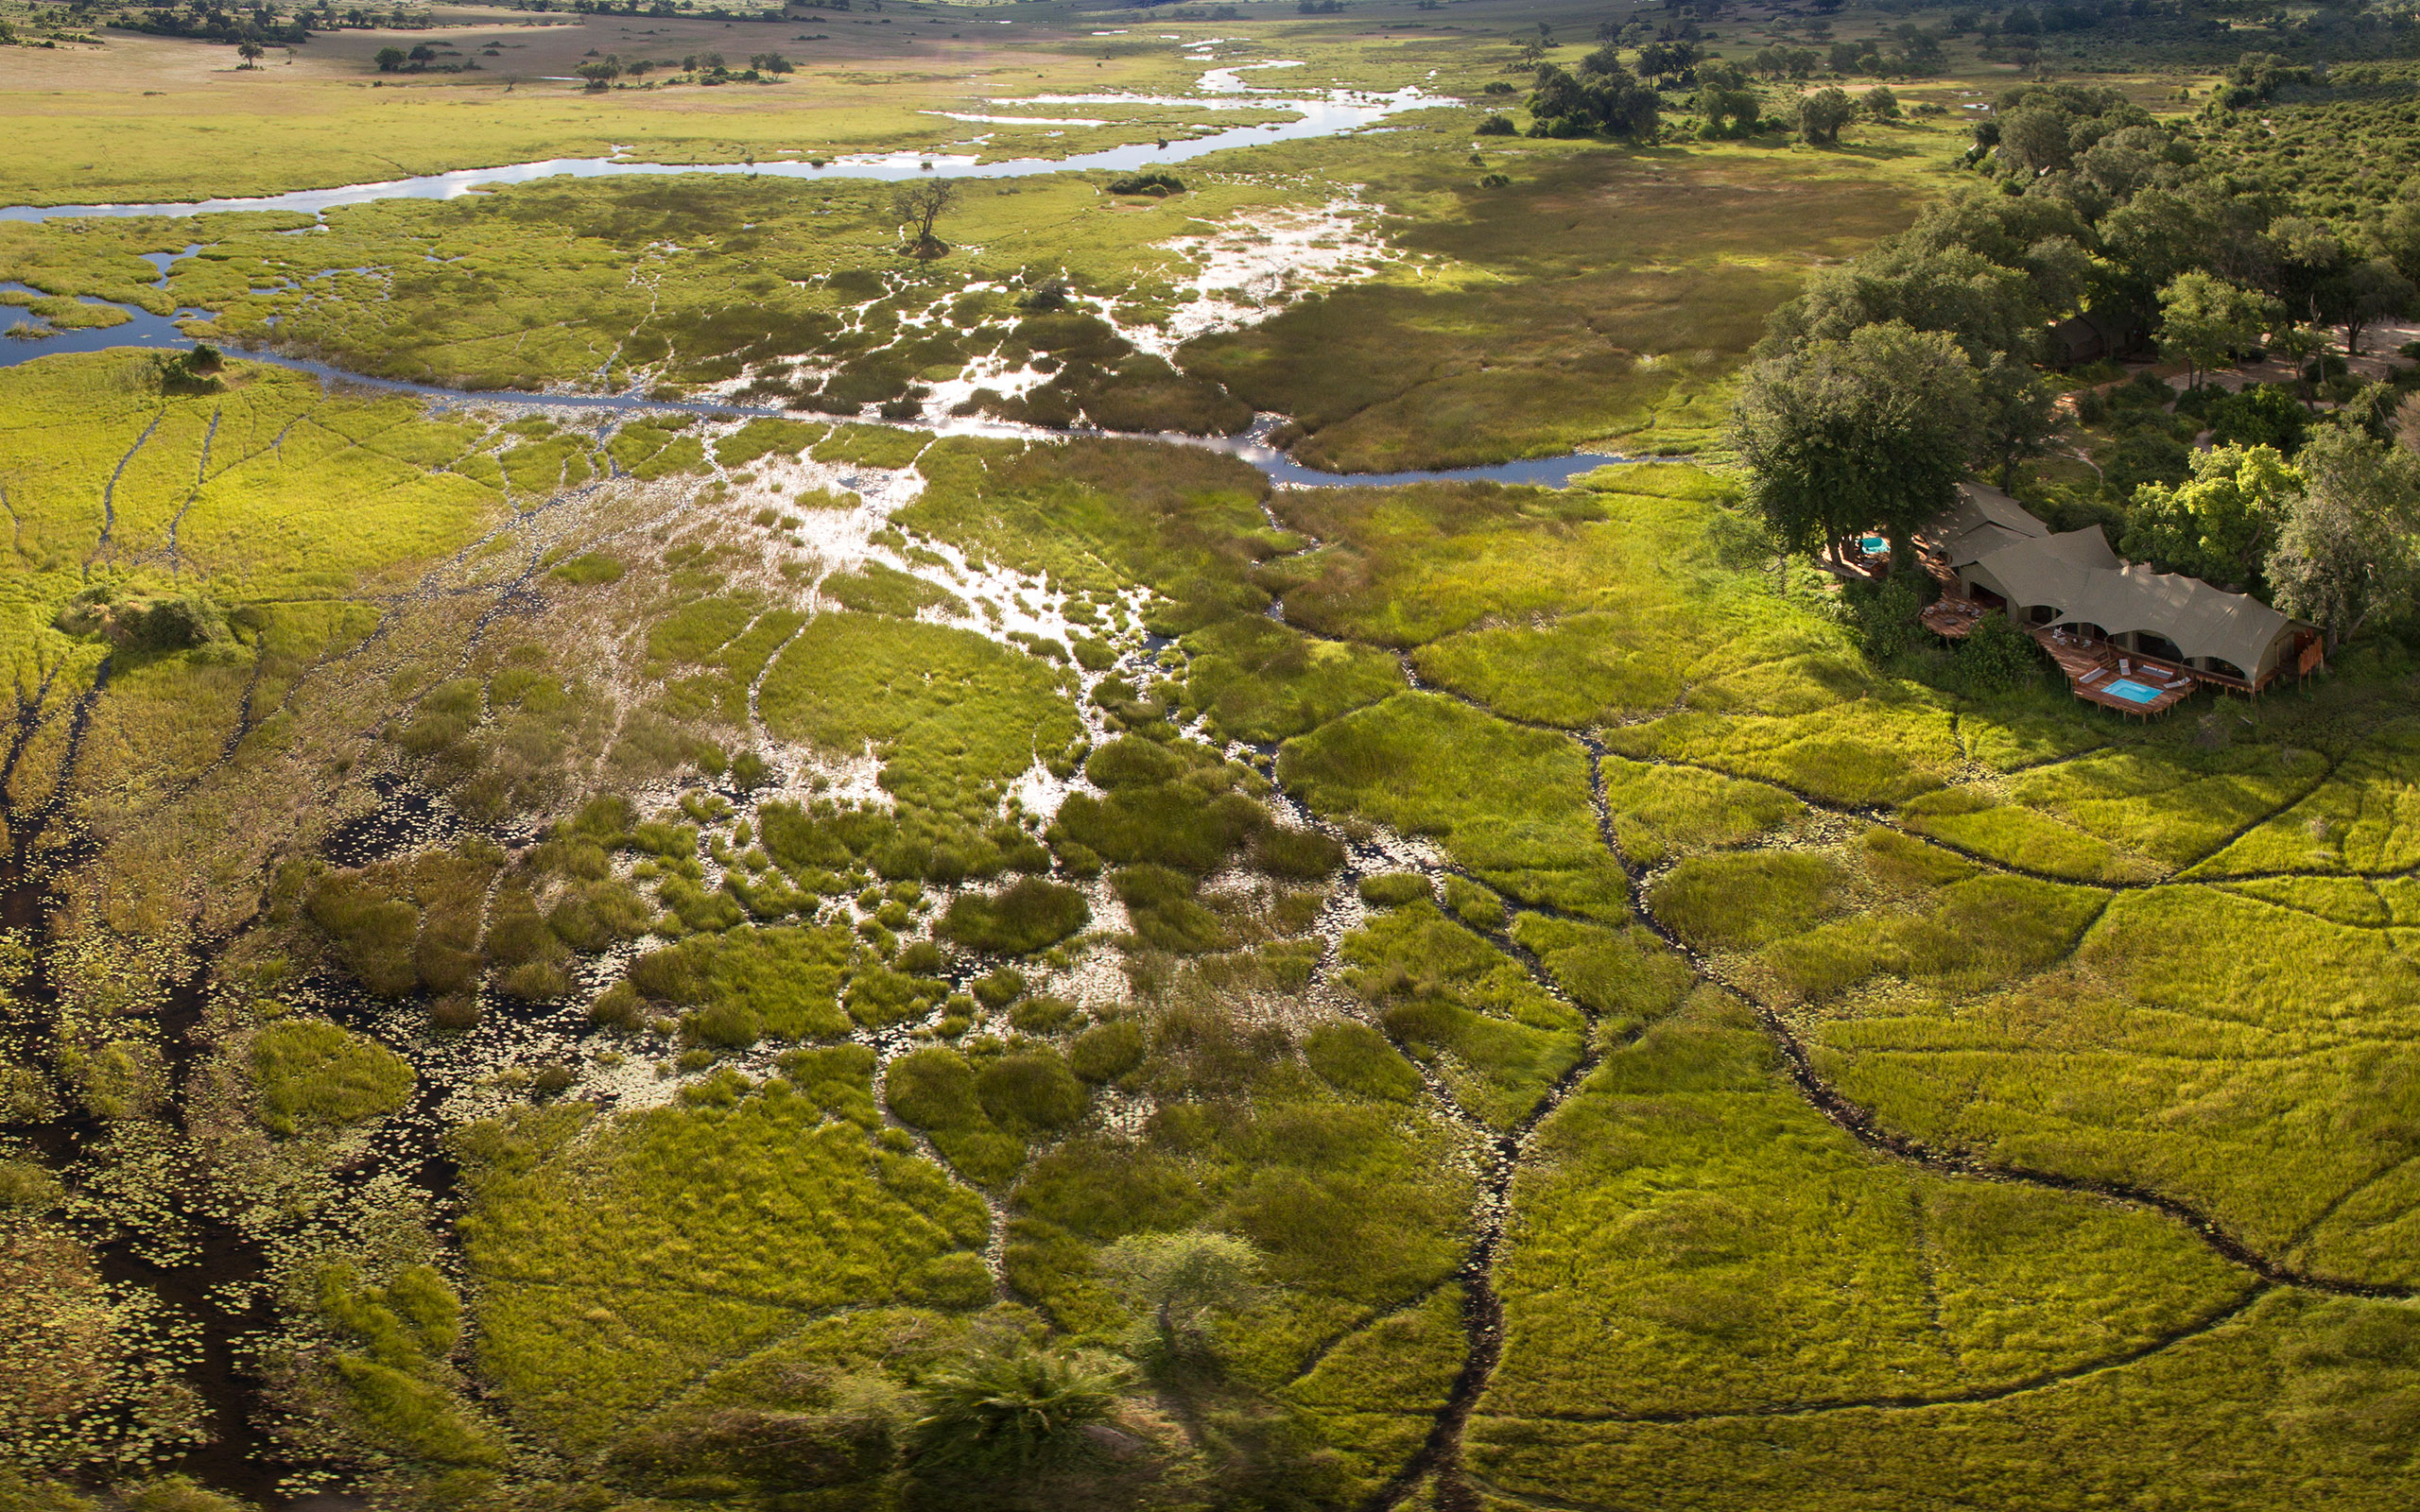 duba plains camp suites aerial panorama enkosi africa botswana delta okavango safari